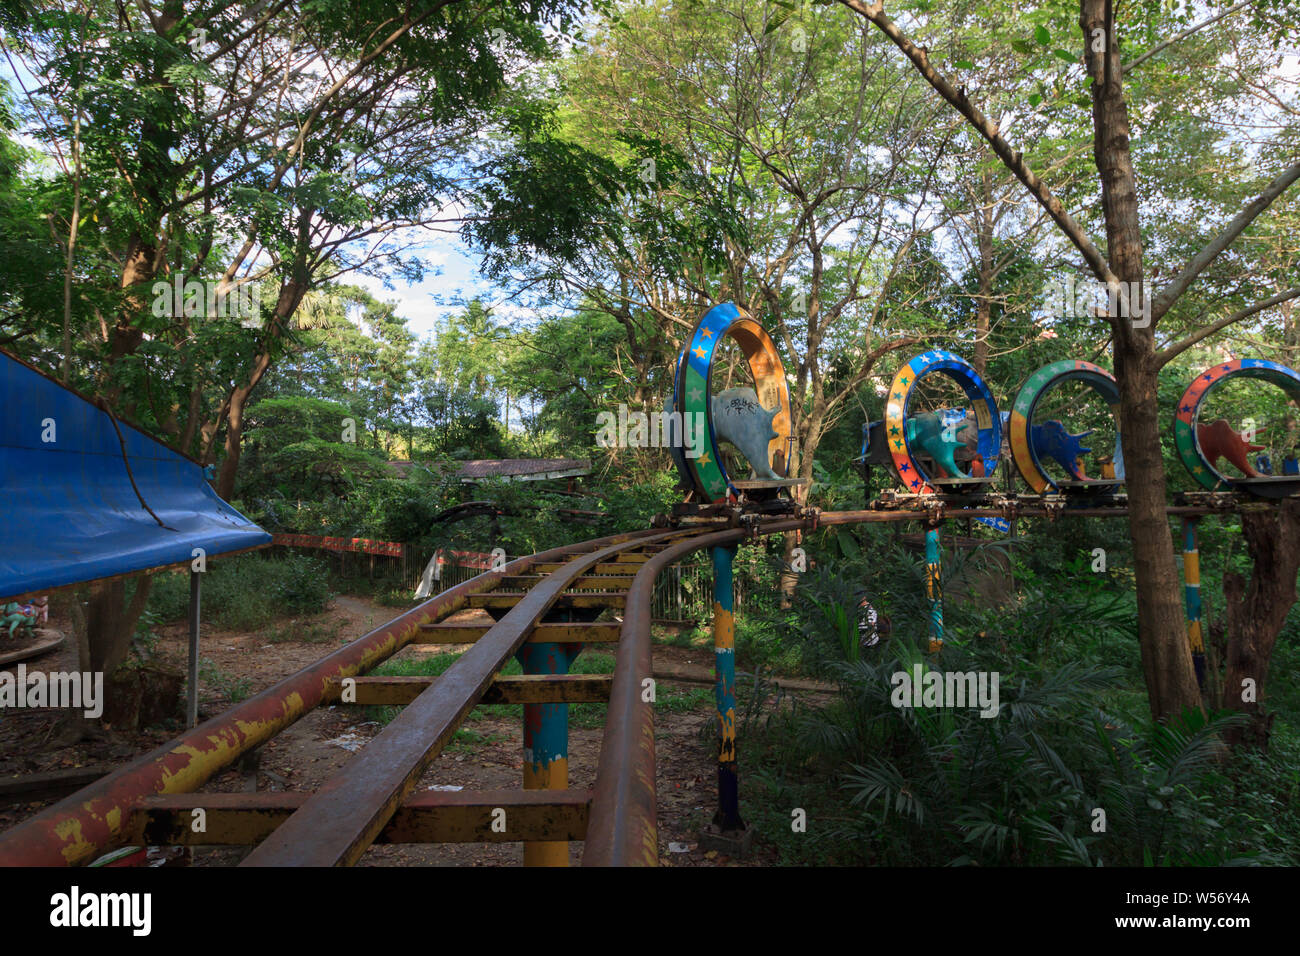 Creepy Abandoned Amusement Park In Yangon Formerly Known As Rangoon Myanmar Stock Photo Alamy